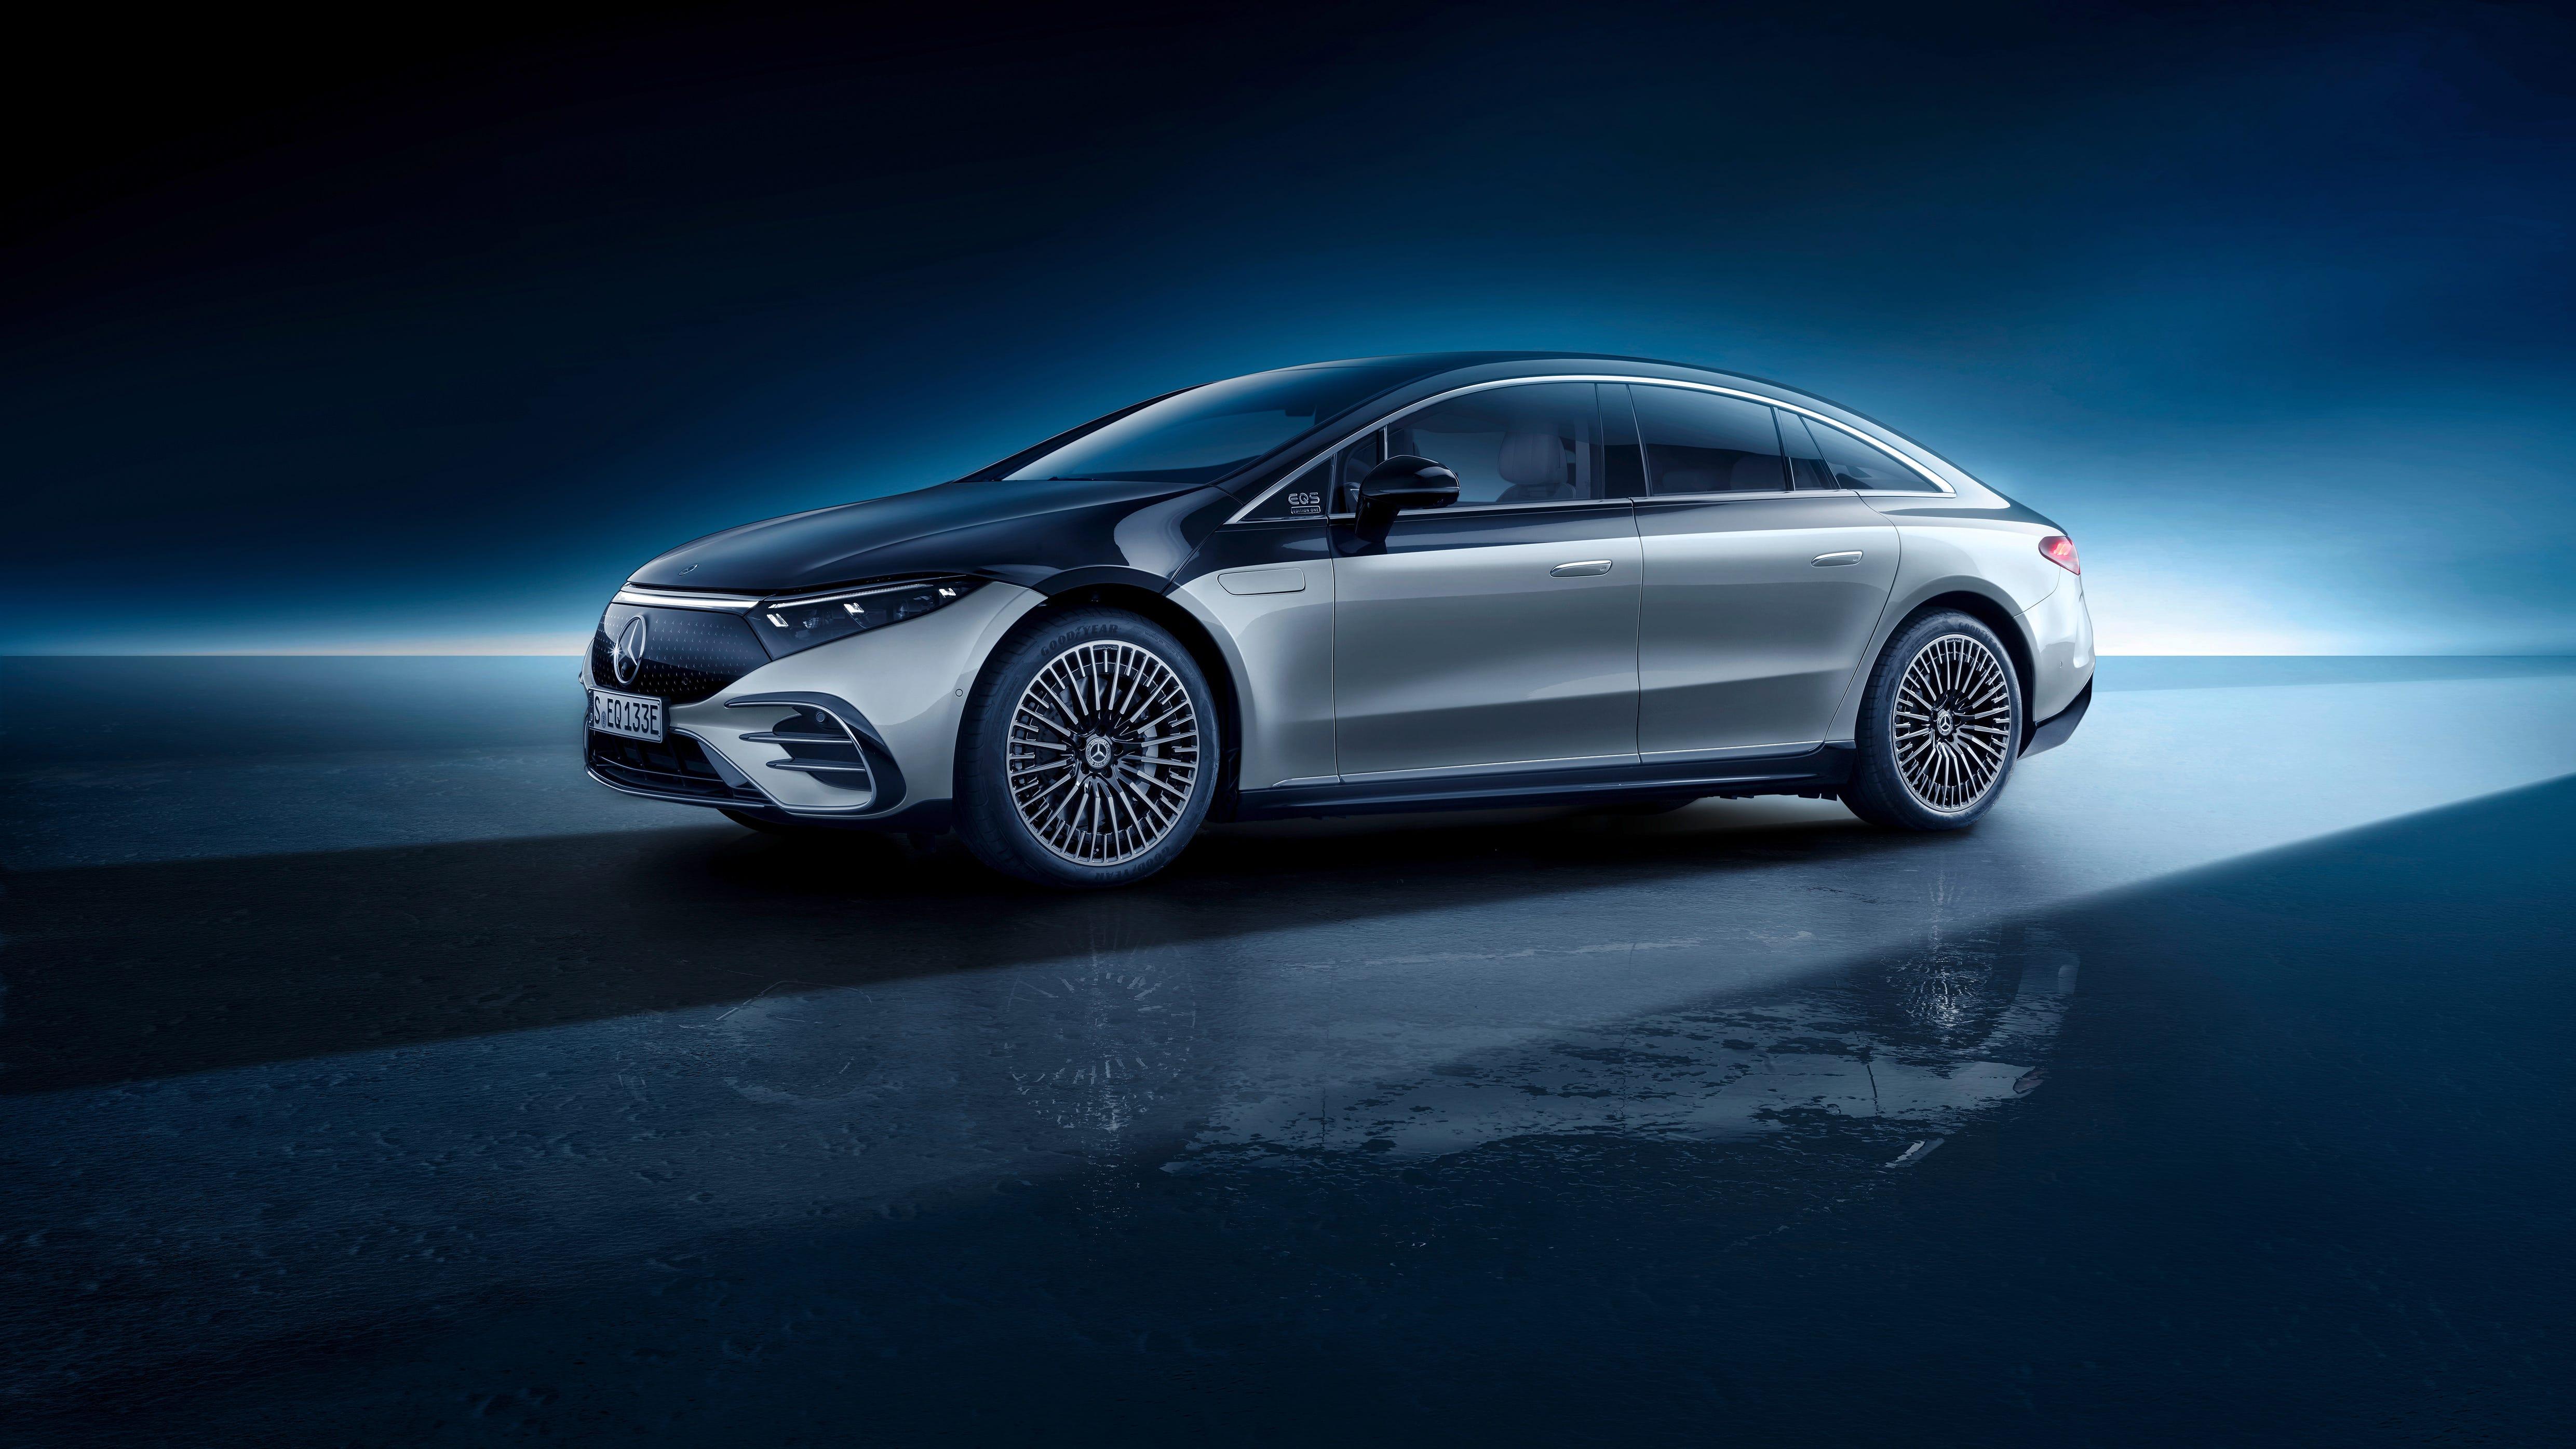 Mercedes-Benz EQS luxury car photos: Luxury sedan revealed